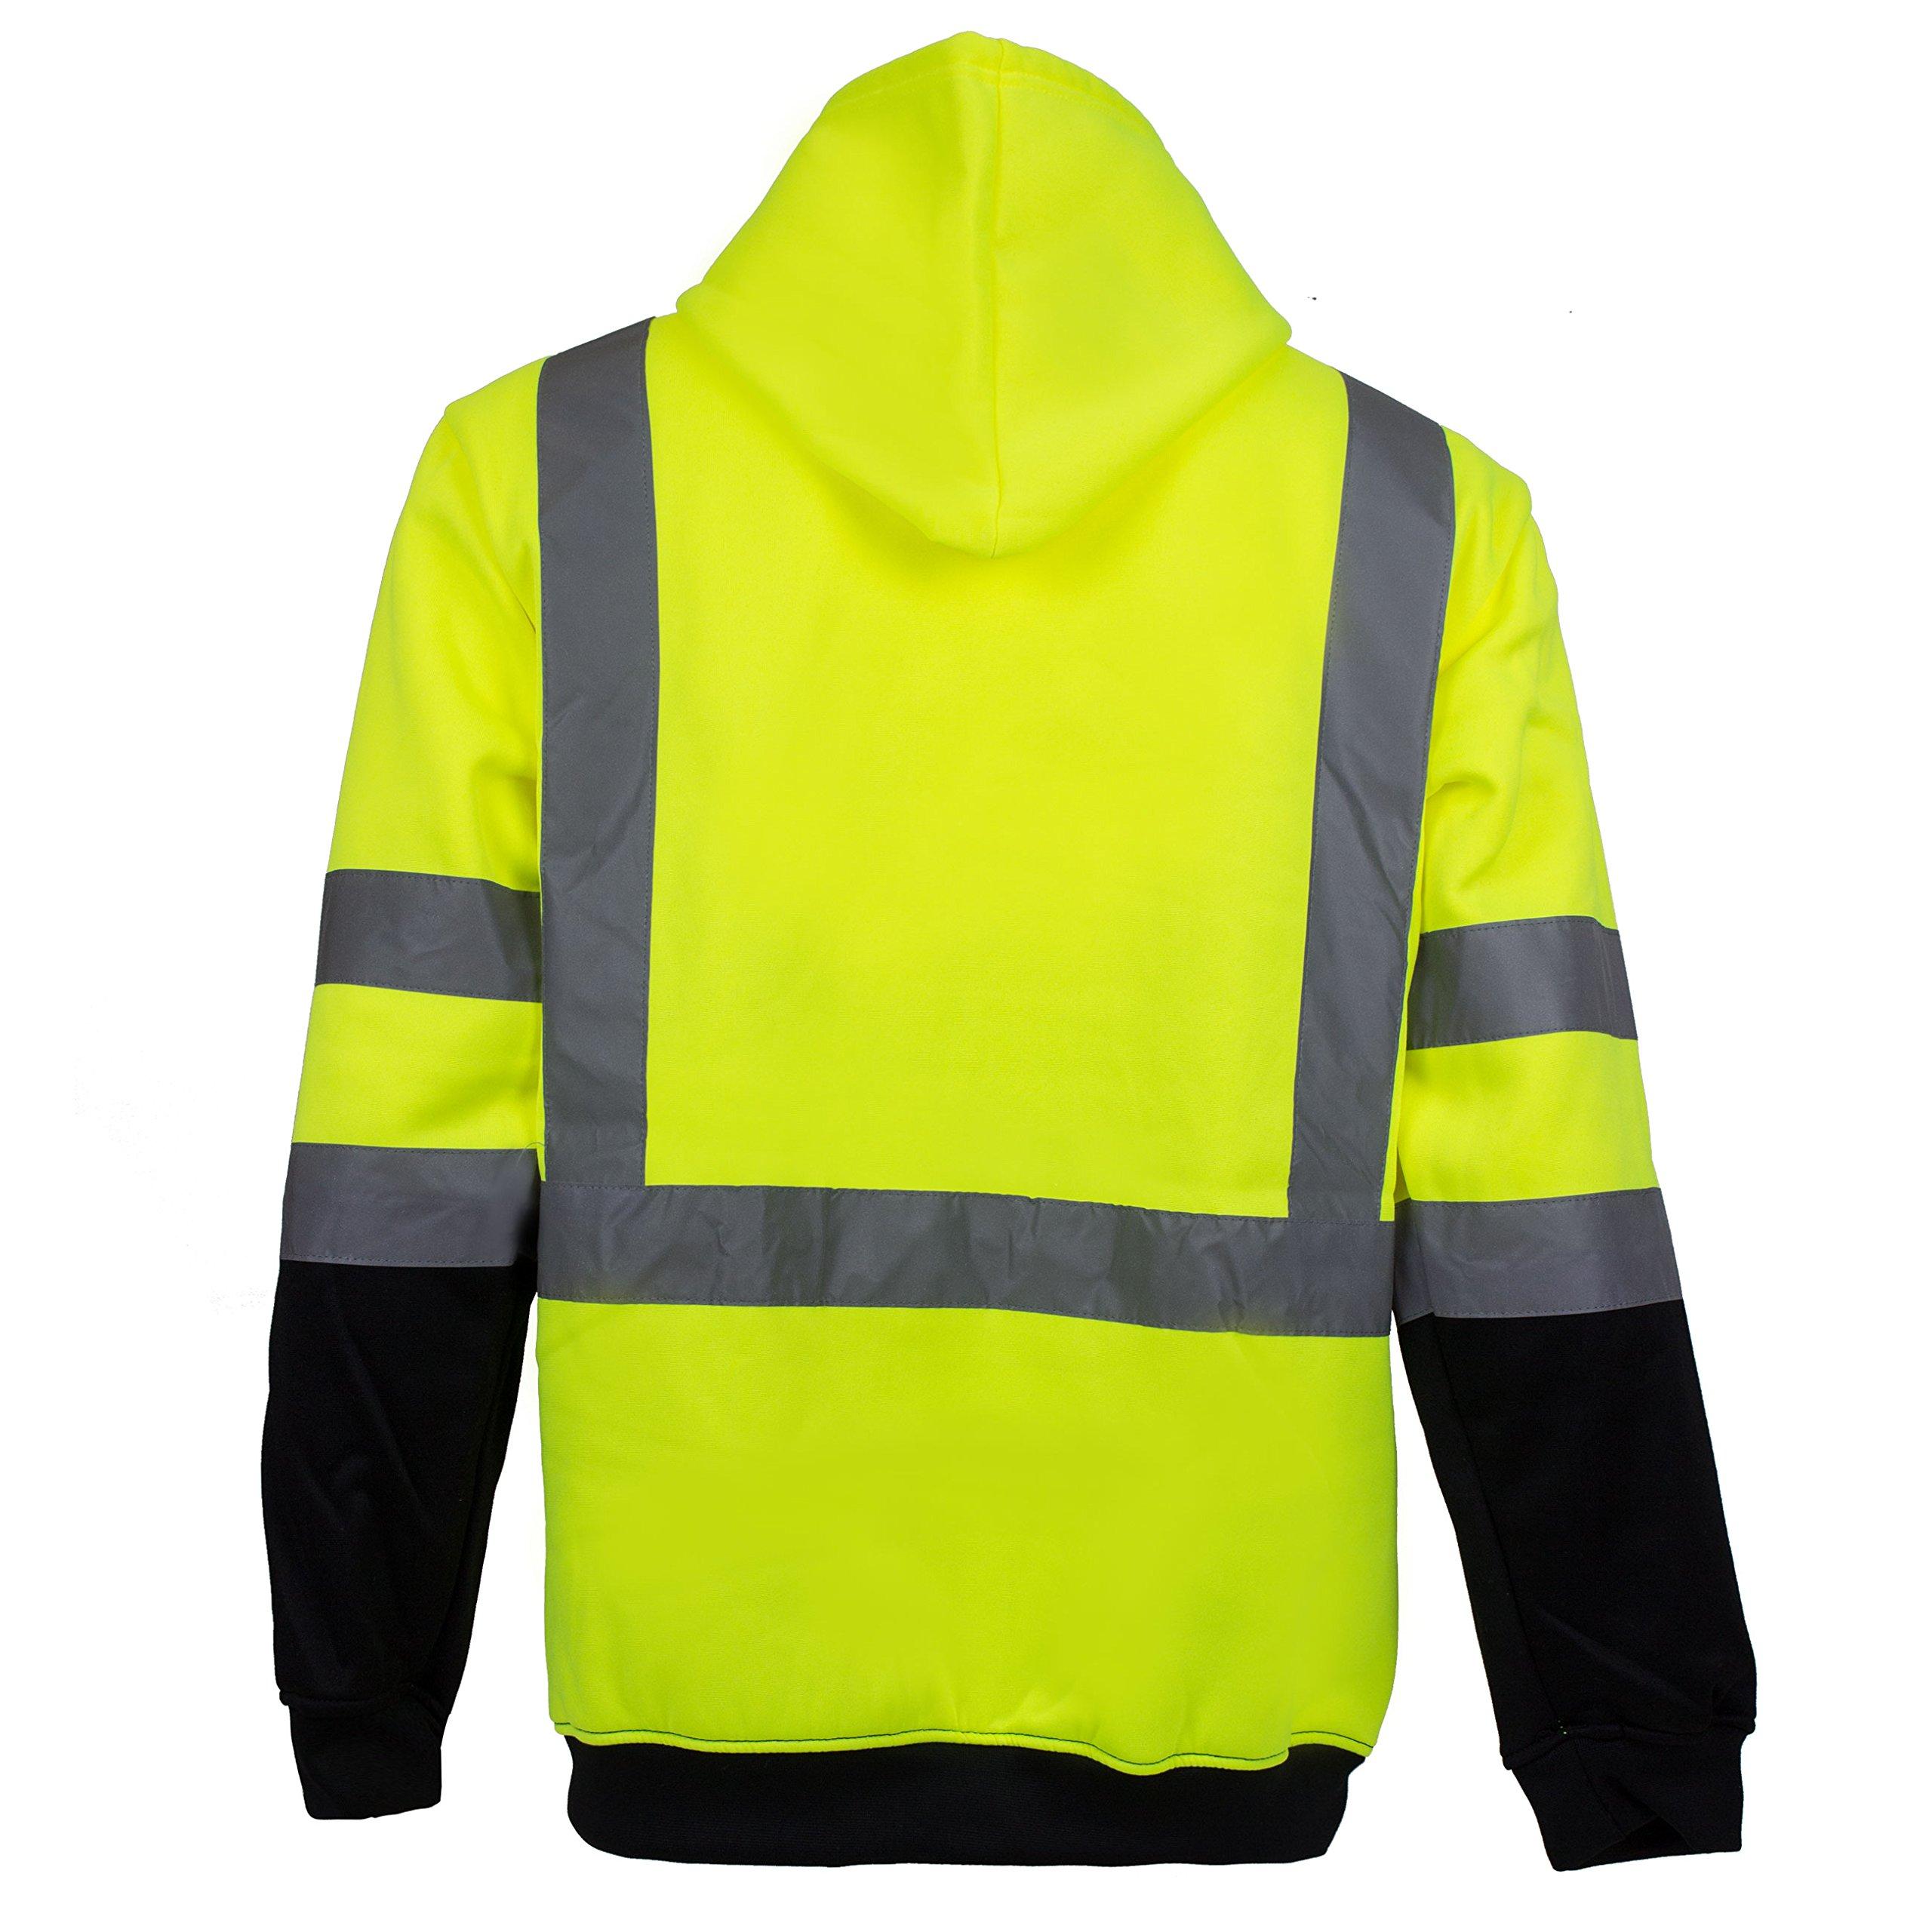 New York Hi-Viz Workwear H9012 Men's ANSI Class 3 High Visibility Class 3 Sweatshirt, Full Zip Hooded, Lightweight, Black Bottom (XX-Large) by New York Hi-Viz Workwear (Image #3)